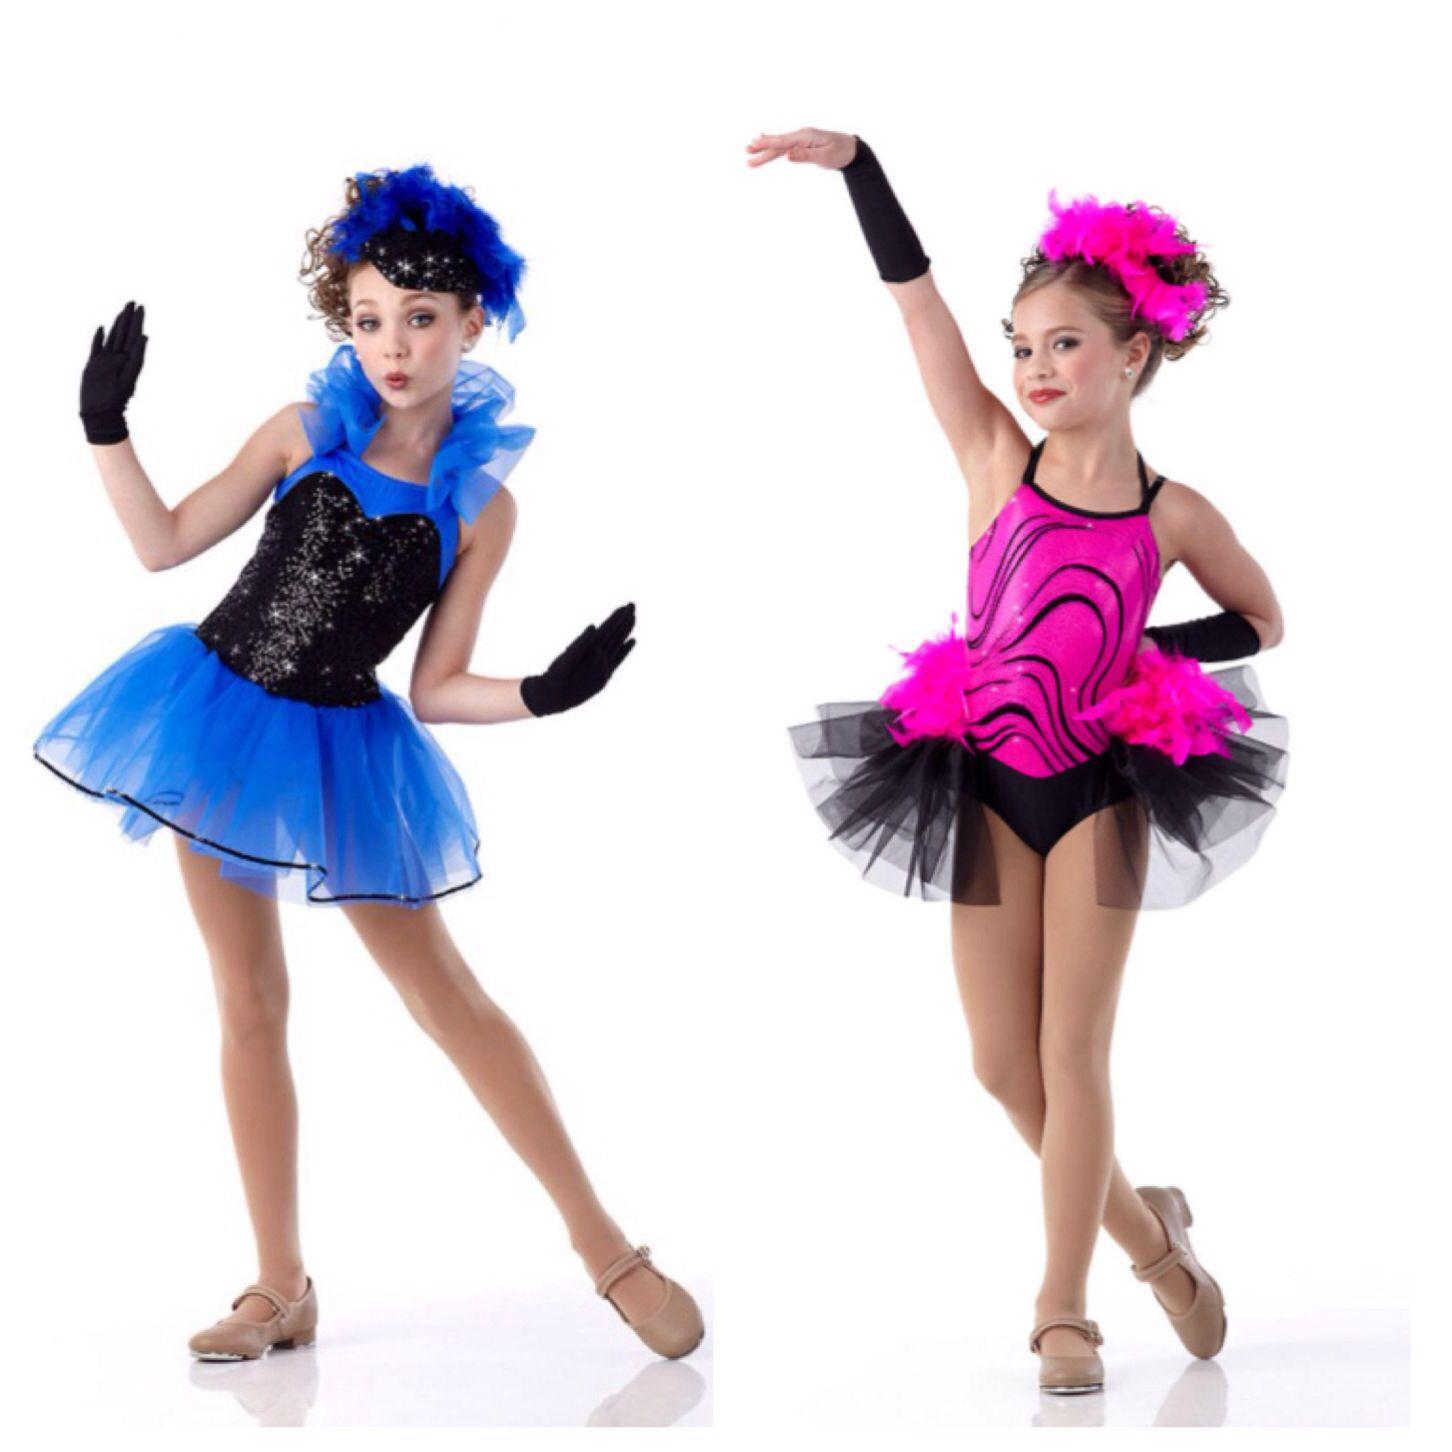 Maddie and Mackenzie for Cici Dance Wear | мα∂∂ιє αи